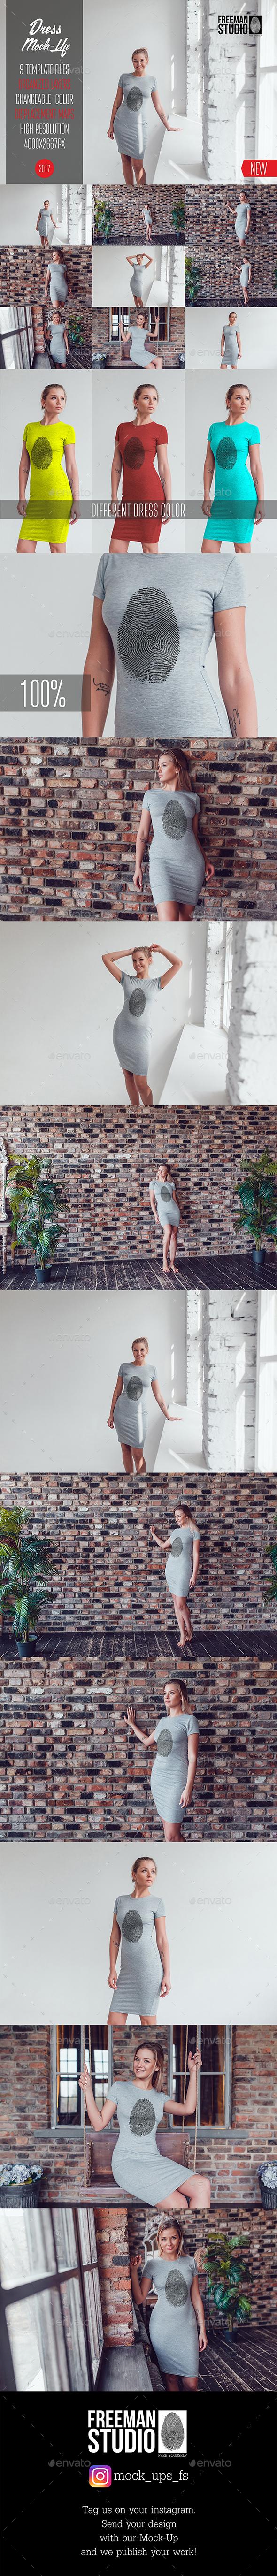 Dress Mock-Up Vol.2 2017 - Miscellaneous Apparel